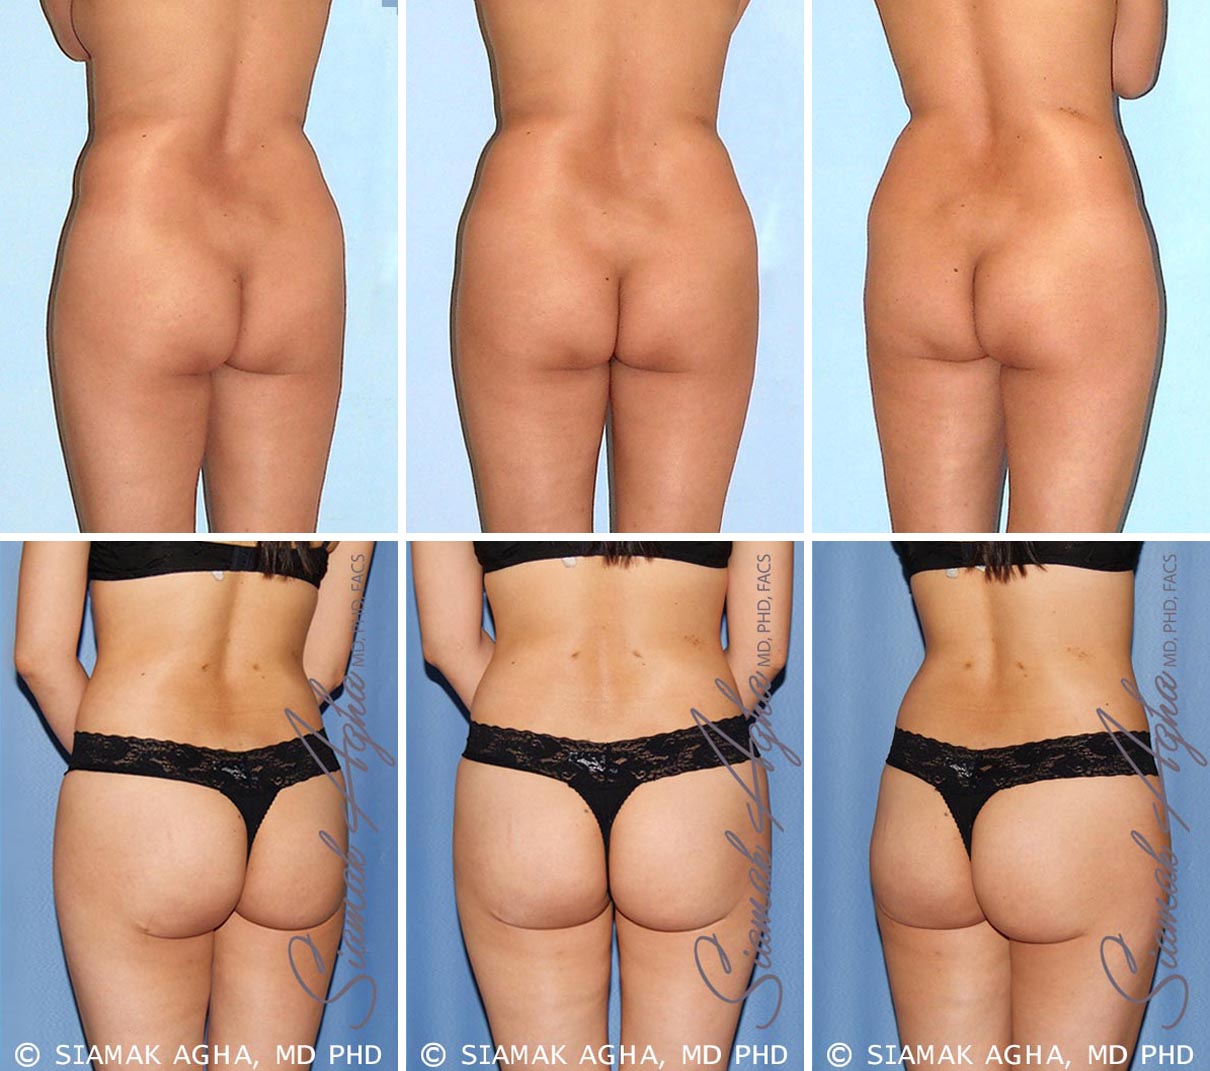 Brazilian Butt Lift Before and After Set 3